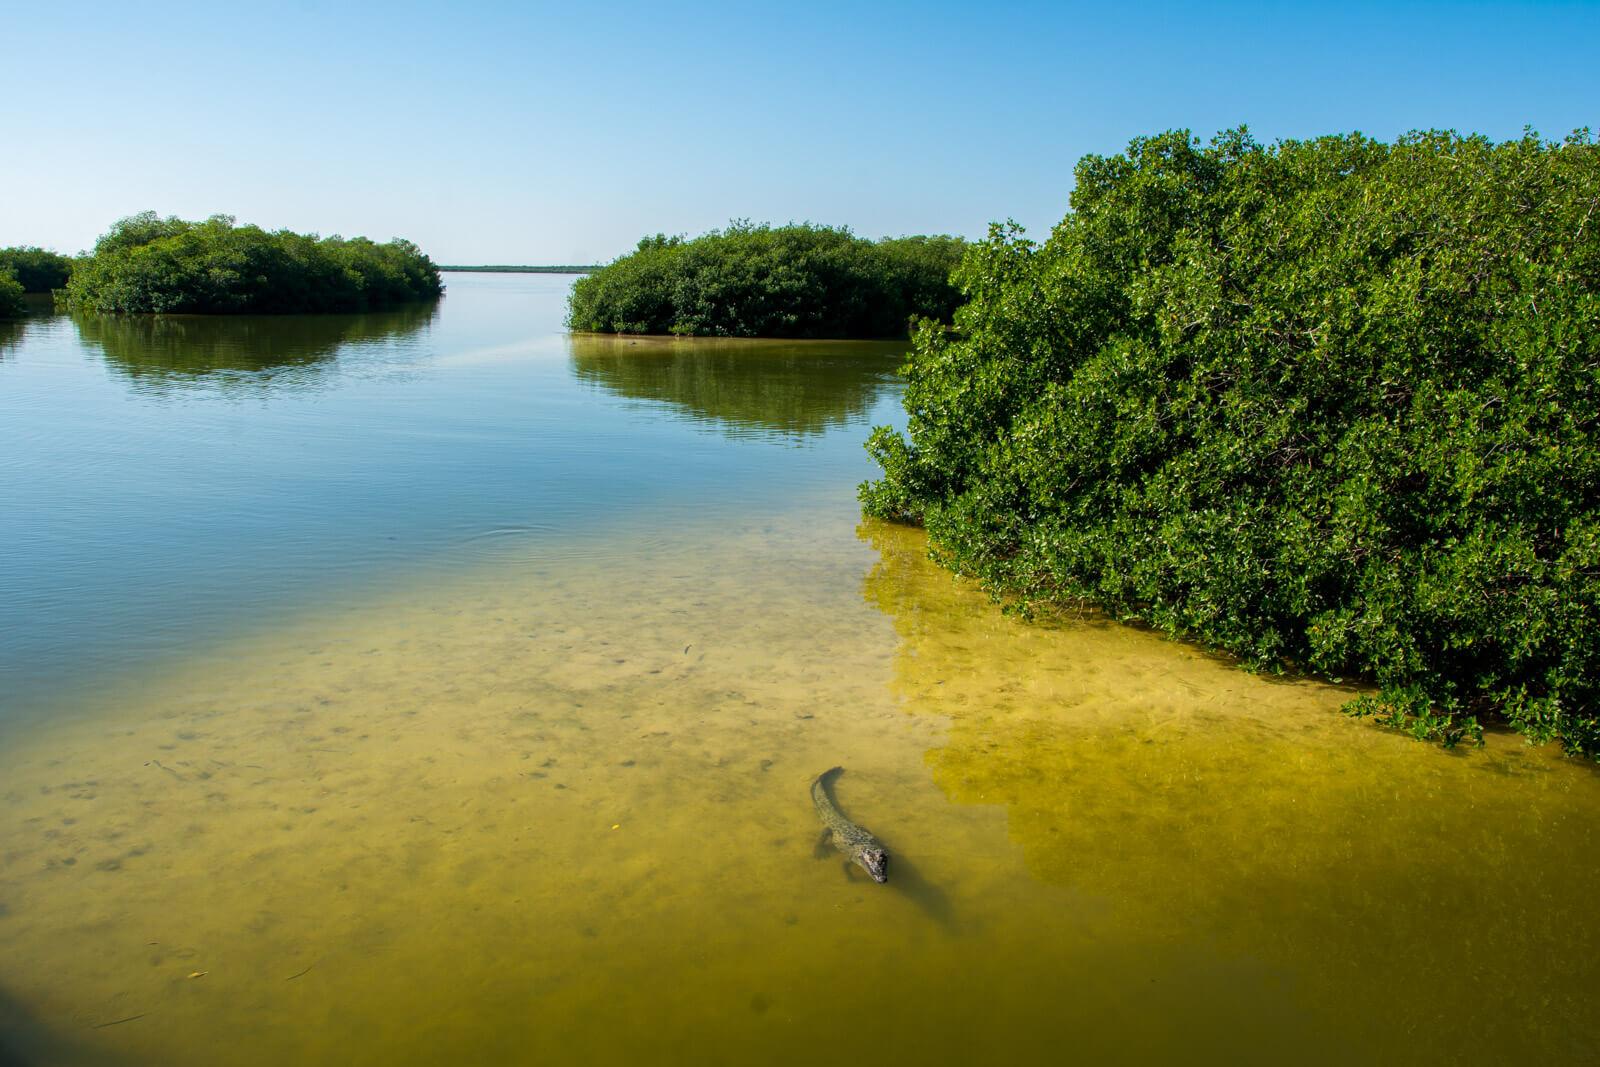 Crocodiles at the Sian Ka'an Biosphere